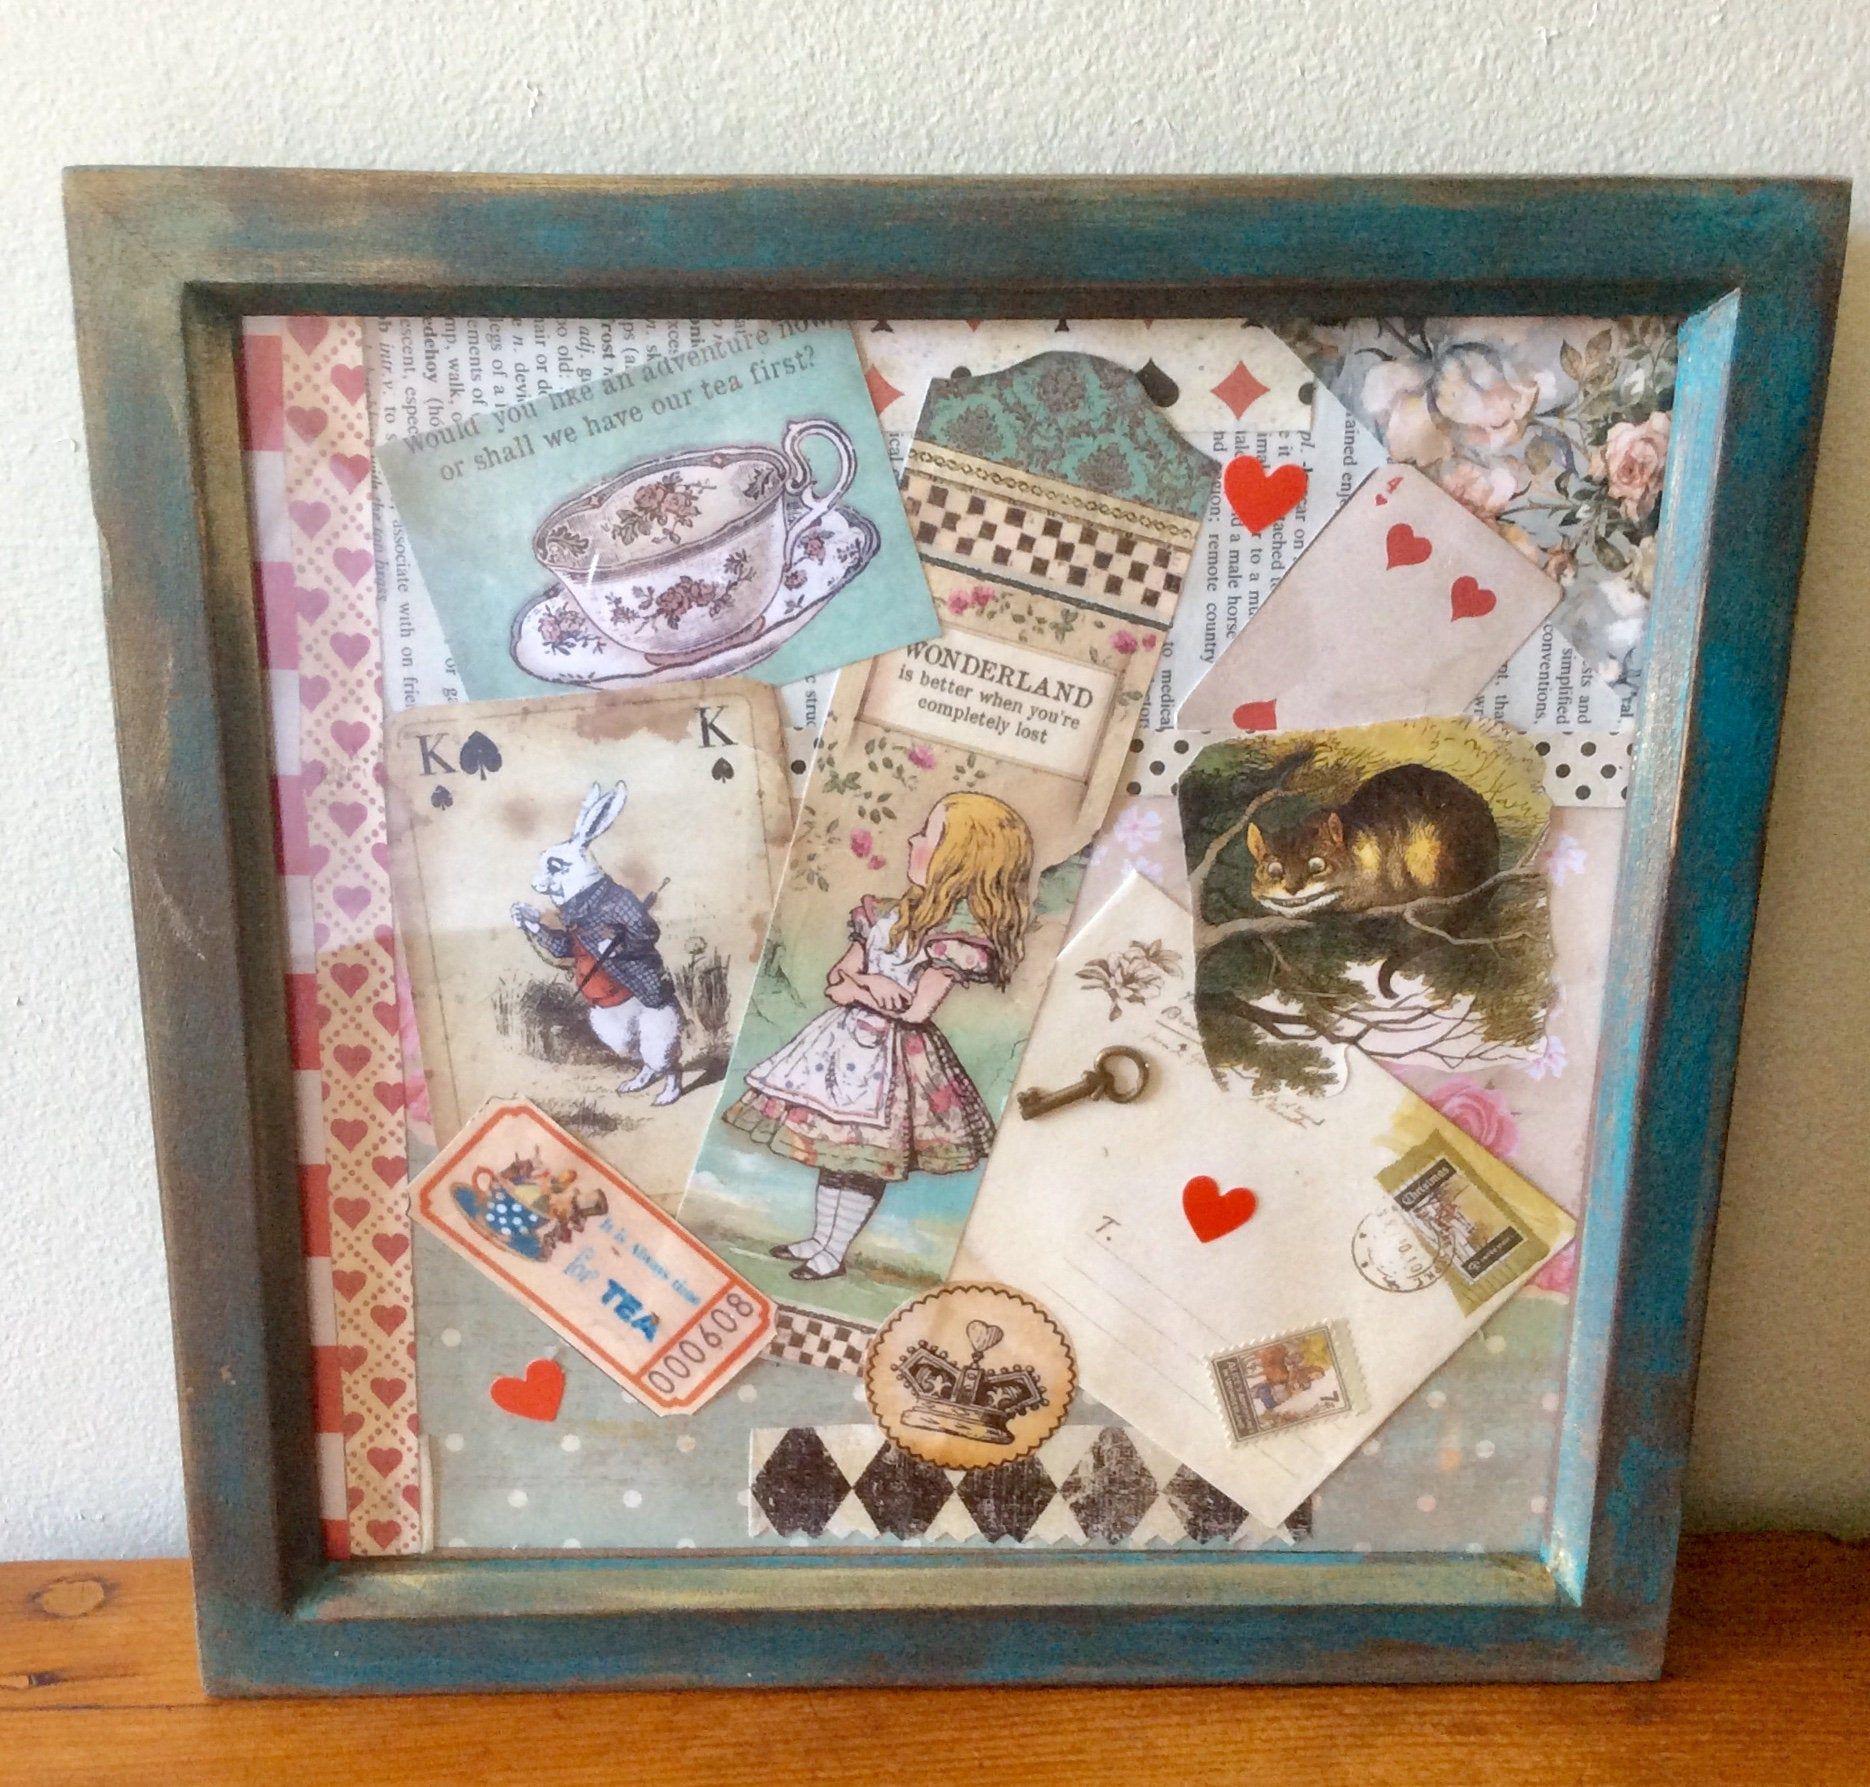 OOAK Alice in Wonderland framed mixed media Alice Art decor Cheshire Cat wall art Mad Hatter White Rabbit Lewis Carroll